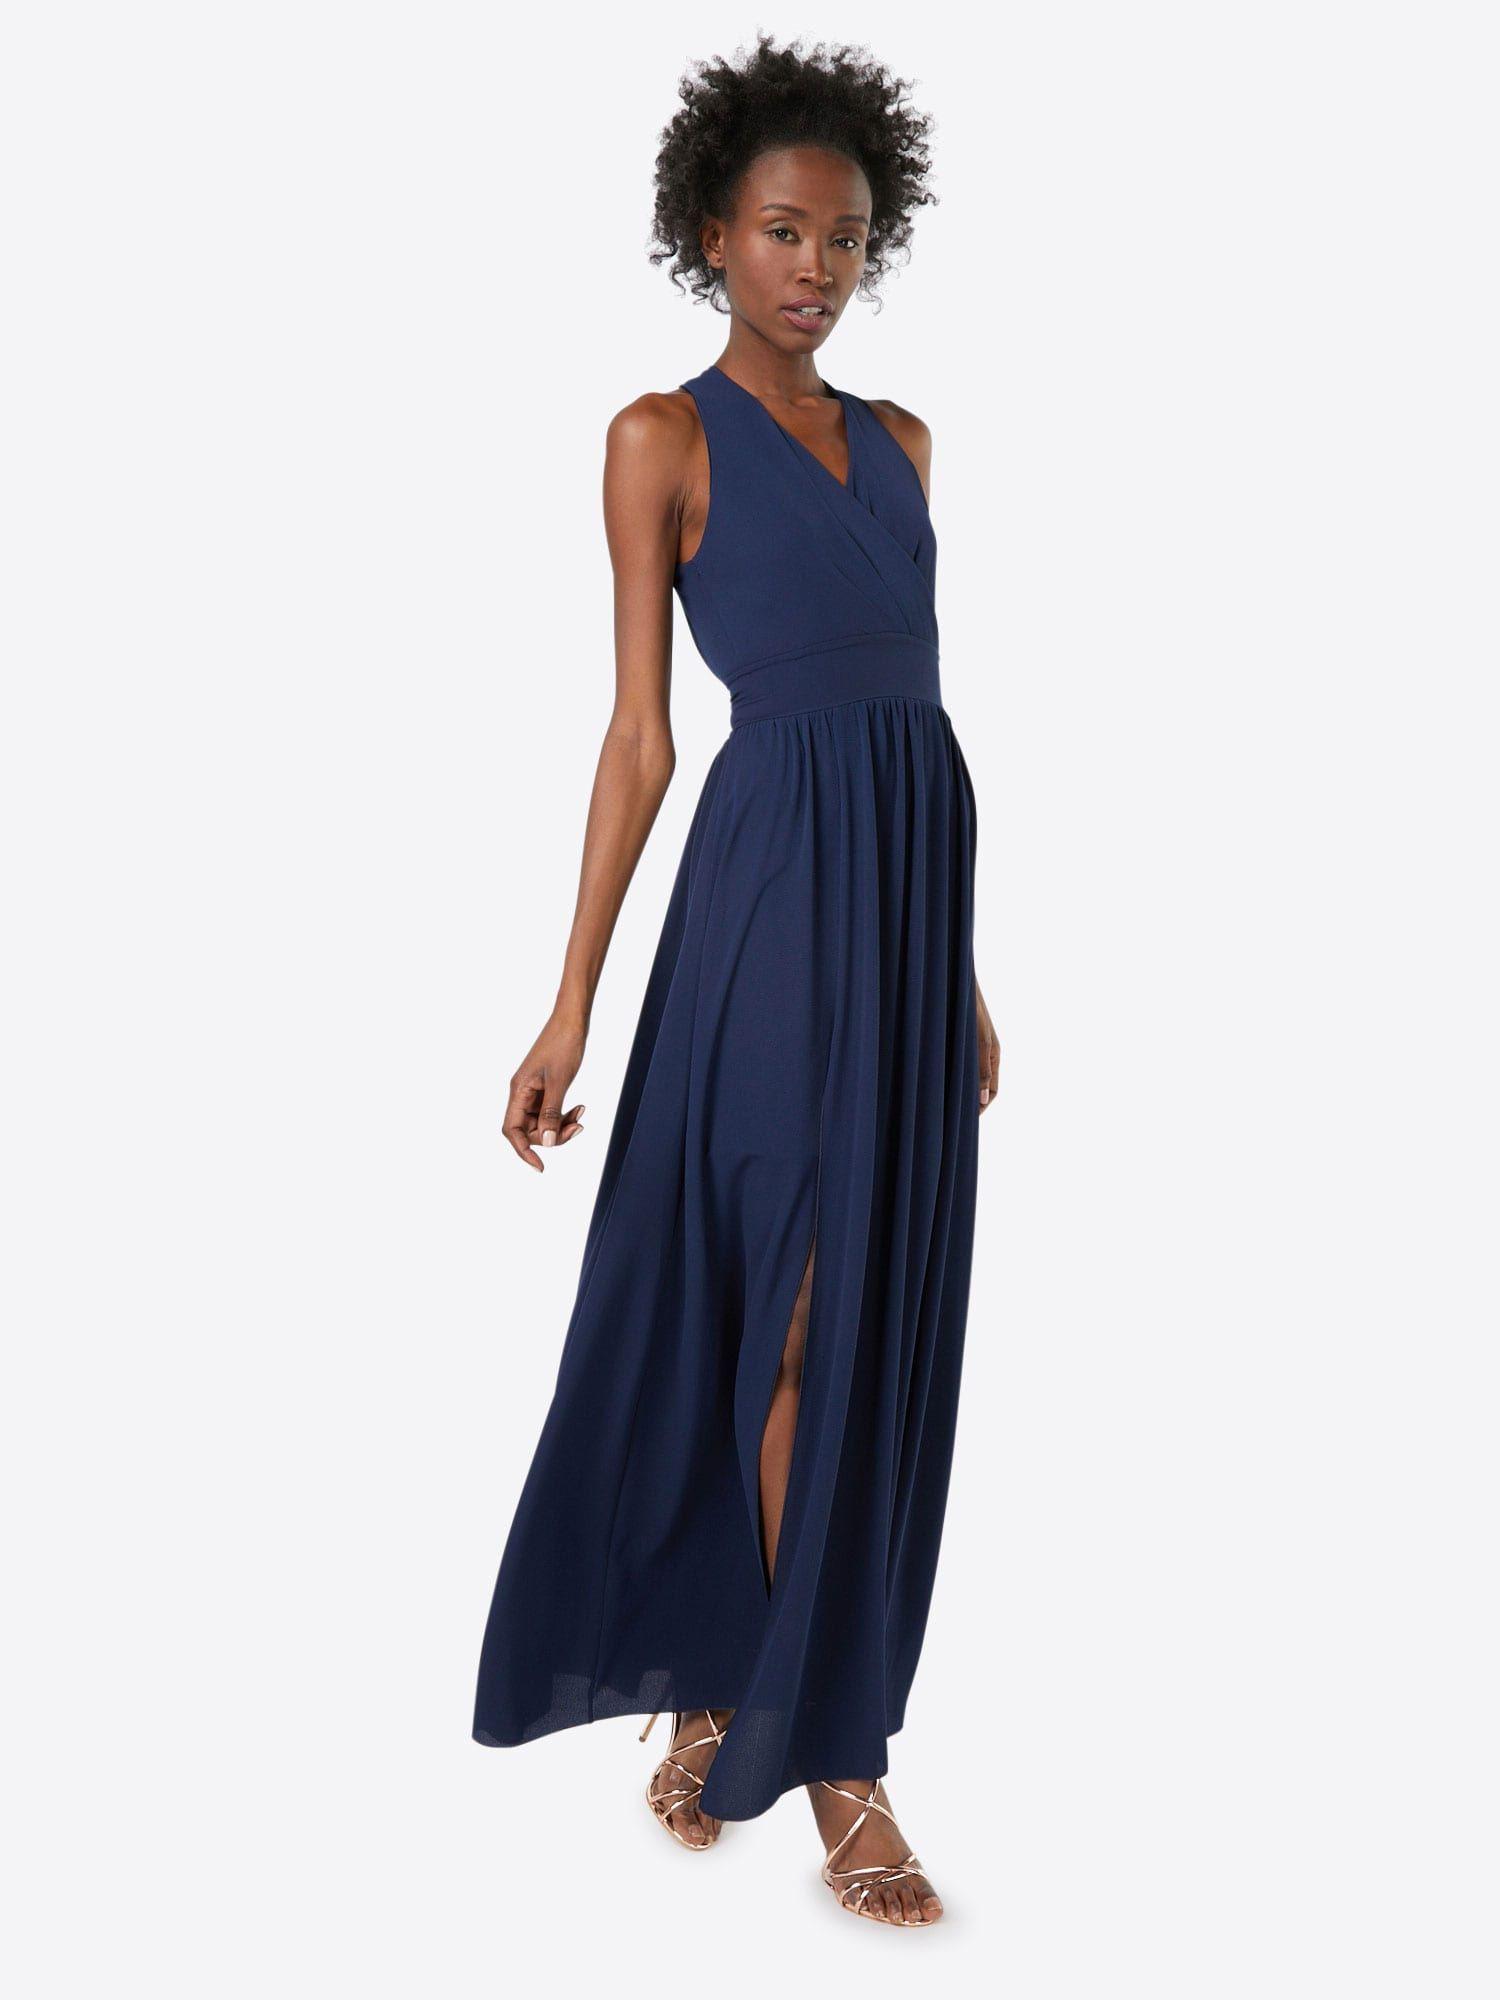 17 Schön Abendkleid Rückenausschnitt Bester Preis20 Coolste Abendkleid Rückenausschnitt Ärmel